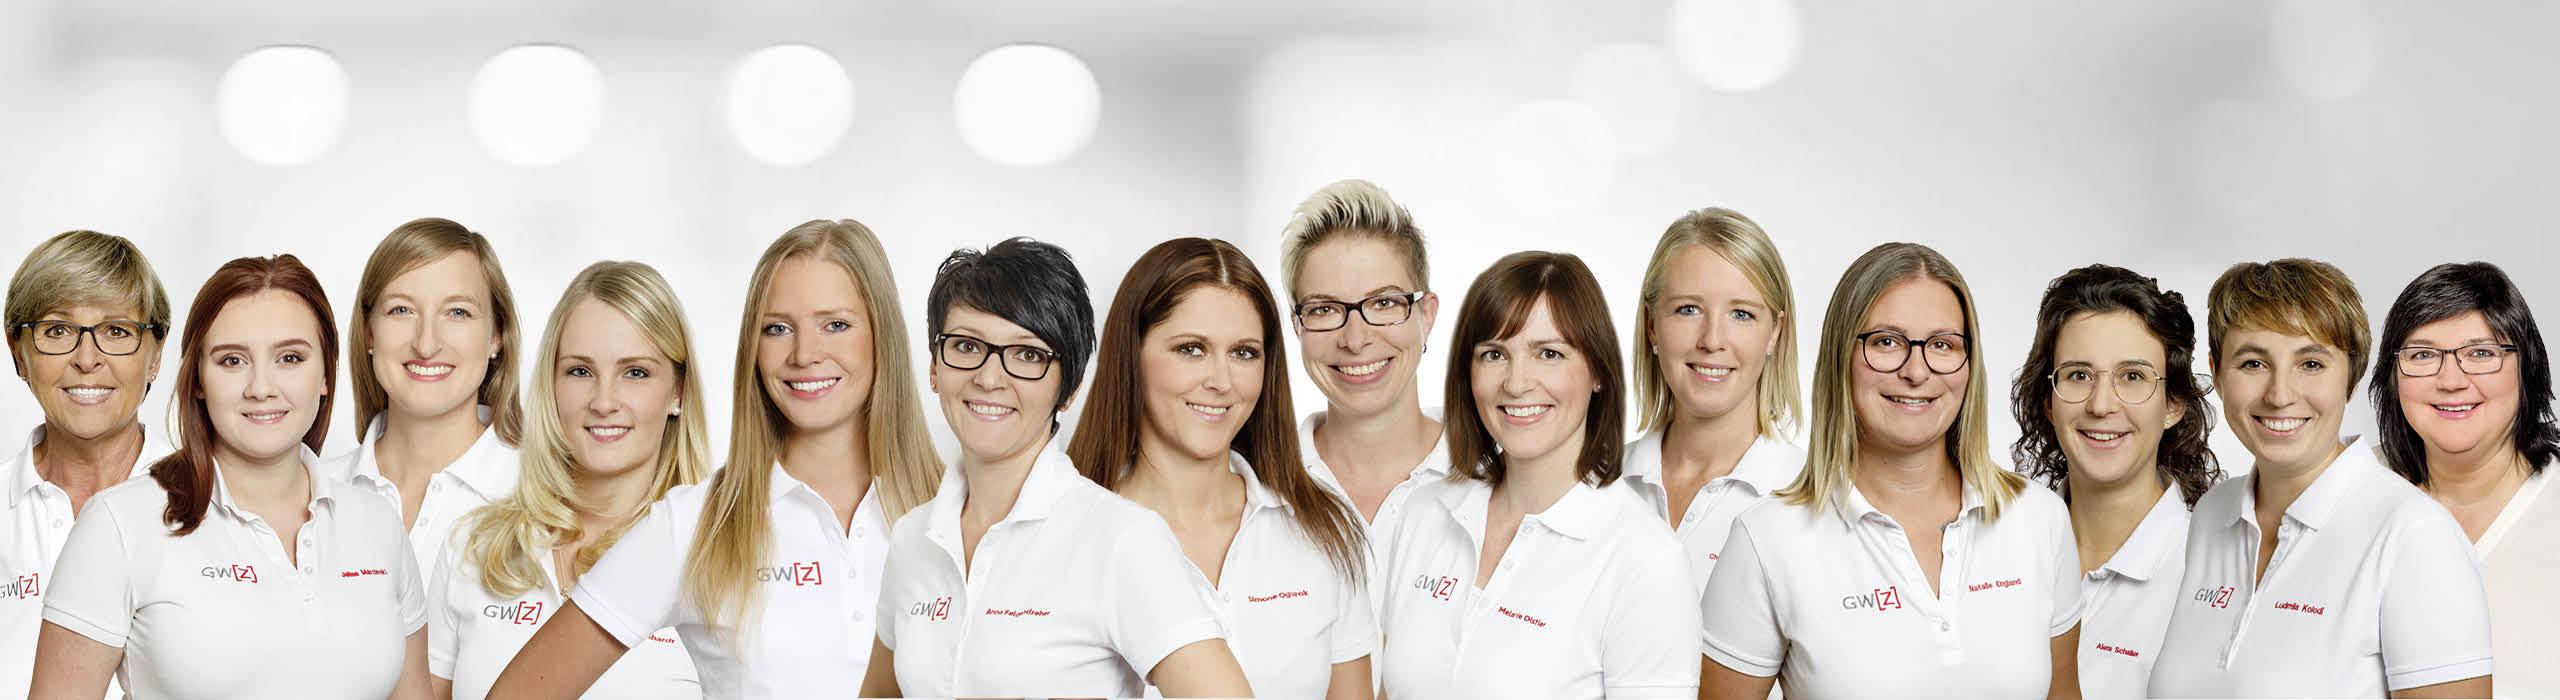 Slider Teambild Praxis |GWZ Bayreuth